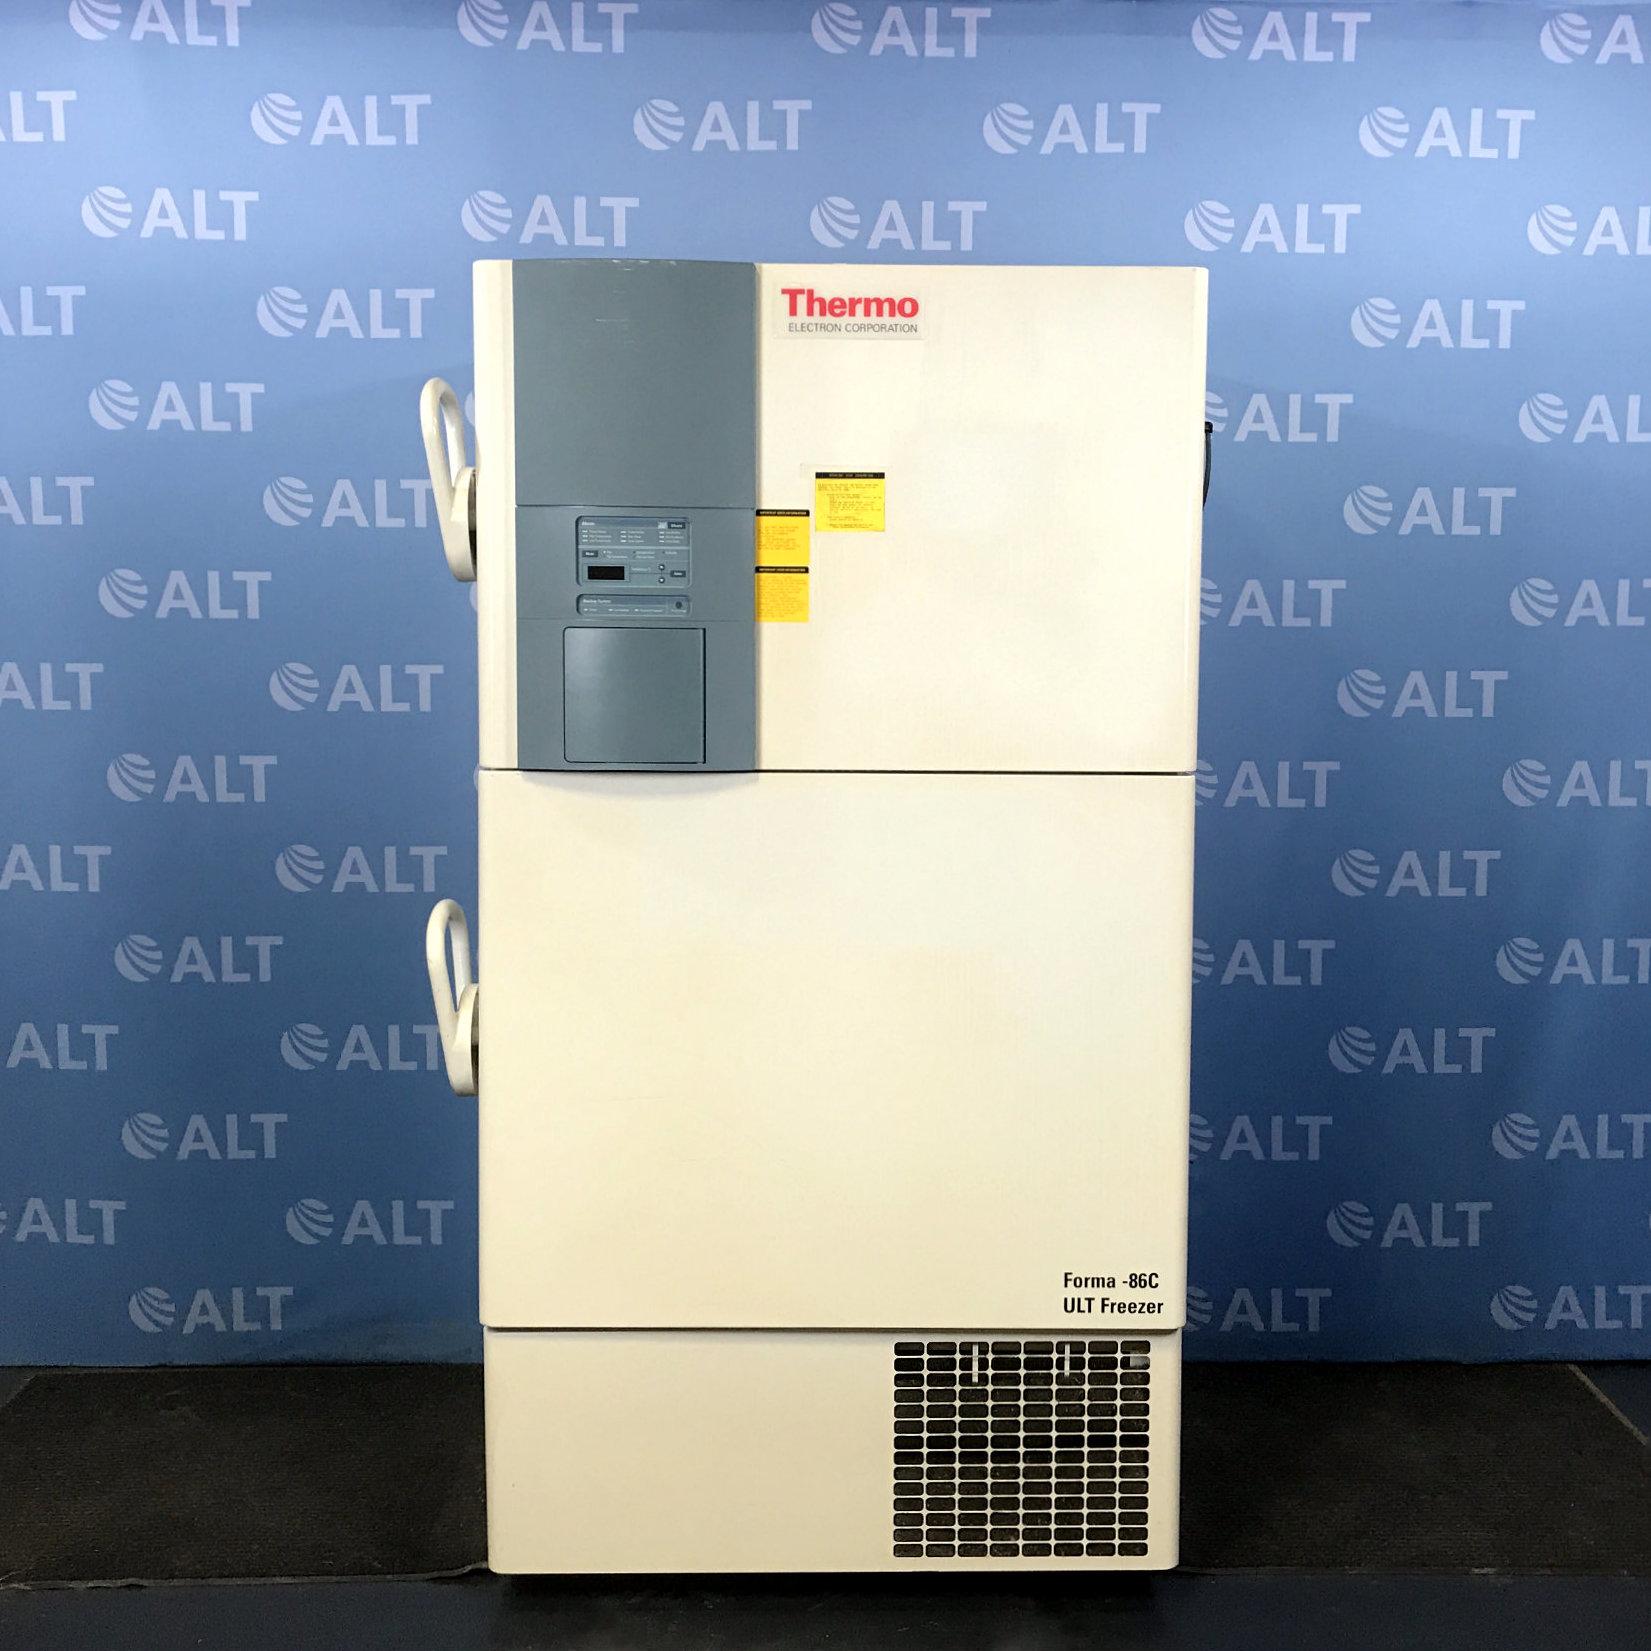 Thermo Forma Model 995 -86C Double Door Ultra-Low Freezer Image